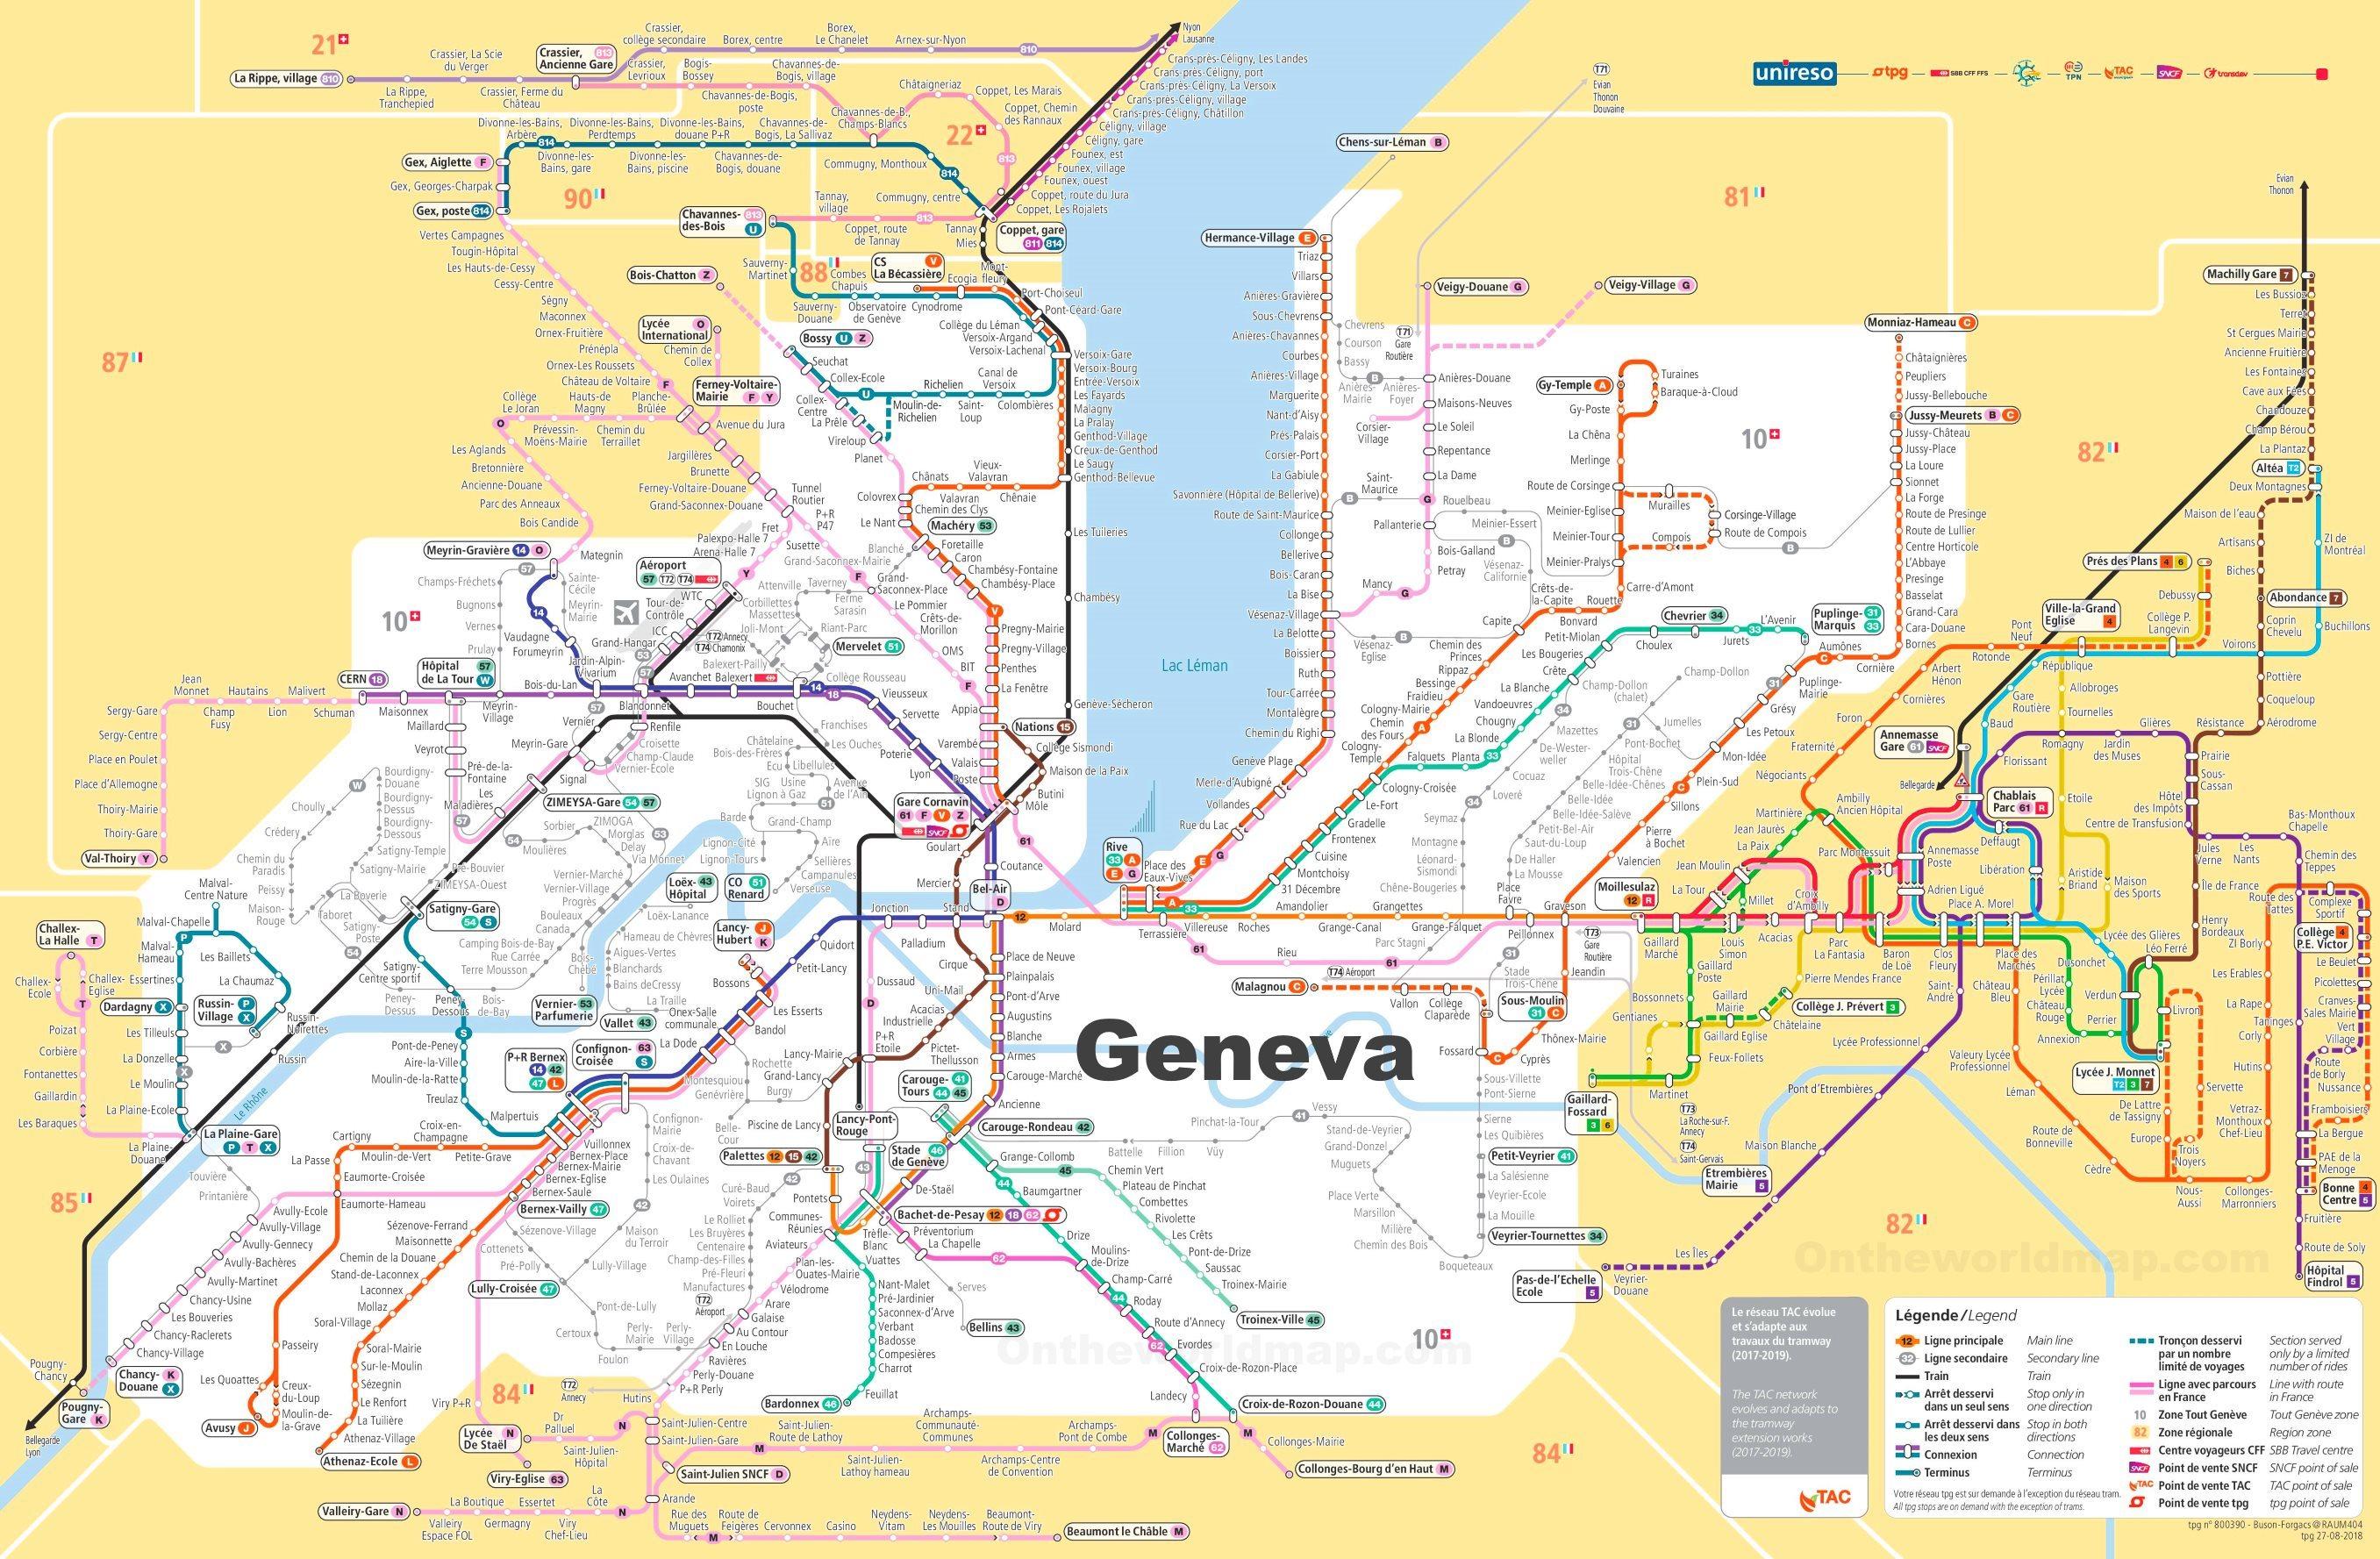 Transport Map of Surroundings of Geneva